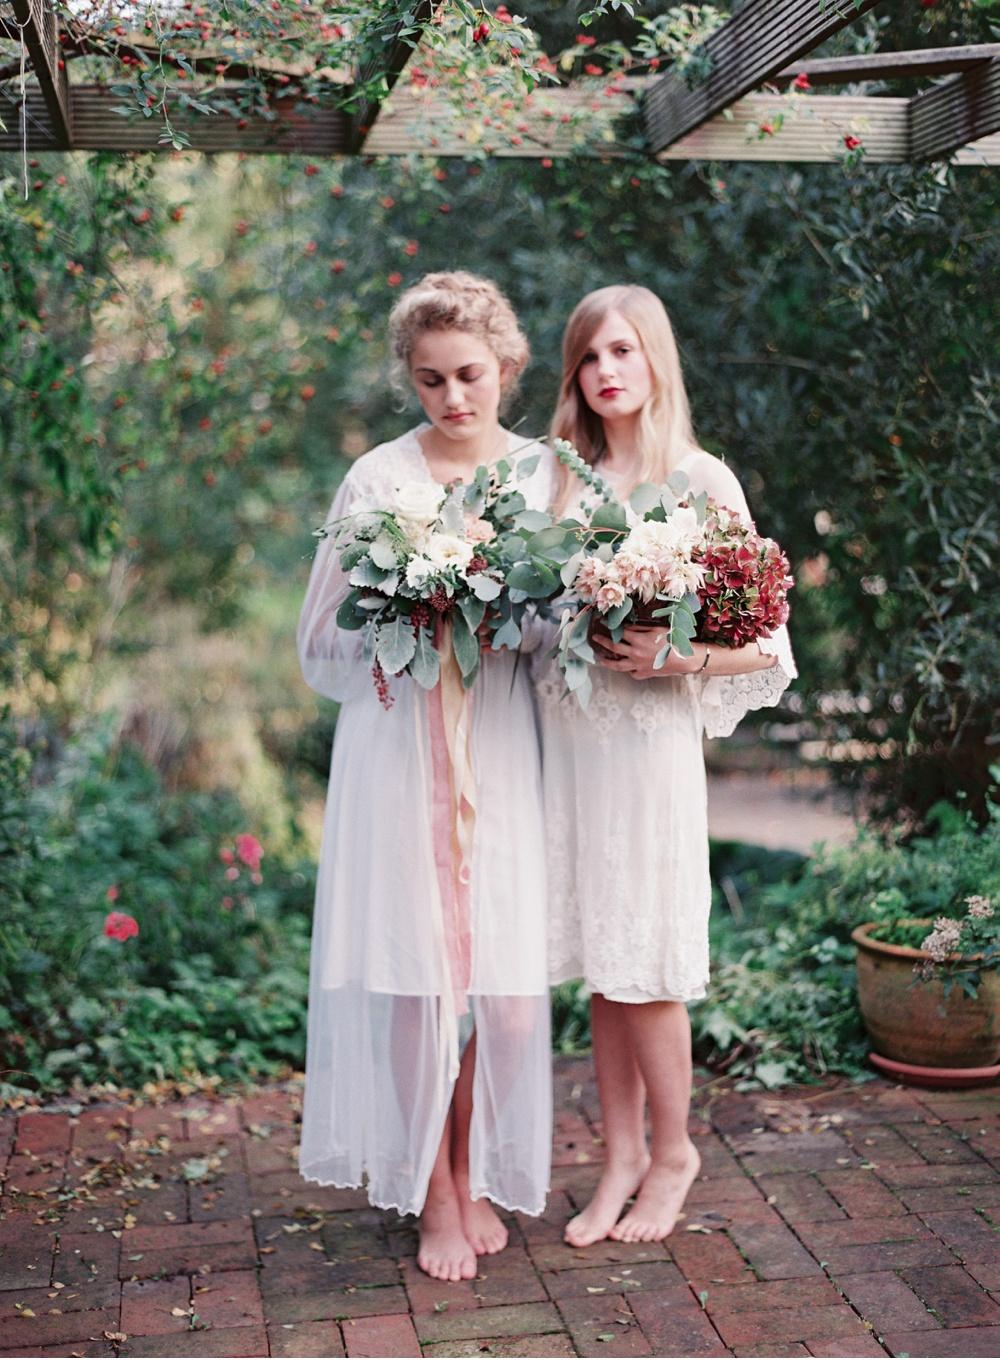 Greenhouse_wedding_inspiration©MadalinaSheldon_0023.jpg